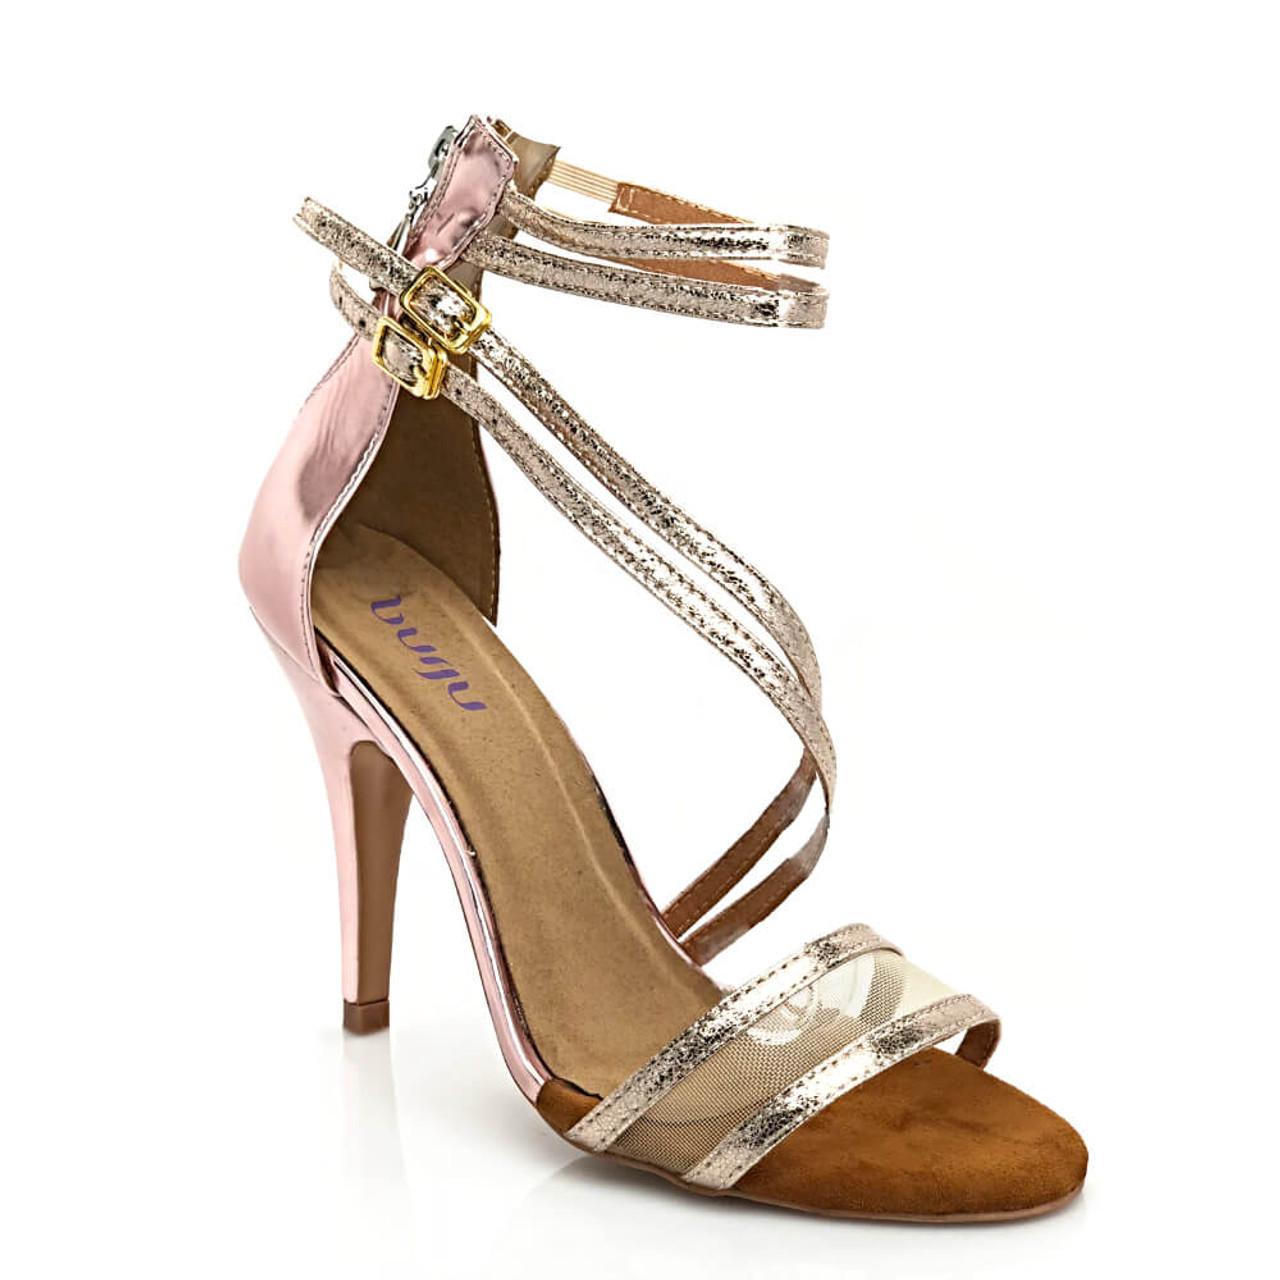 9598d25e174 Lila - Open Toe Metallic Sexy Strappy Heels - Custom Made To Order - B1883